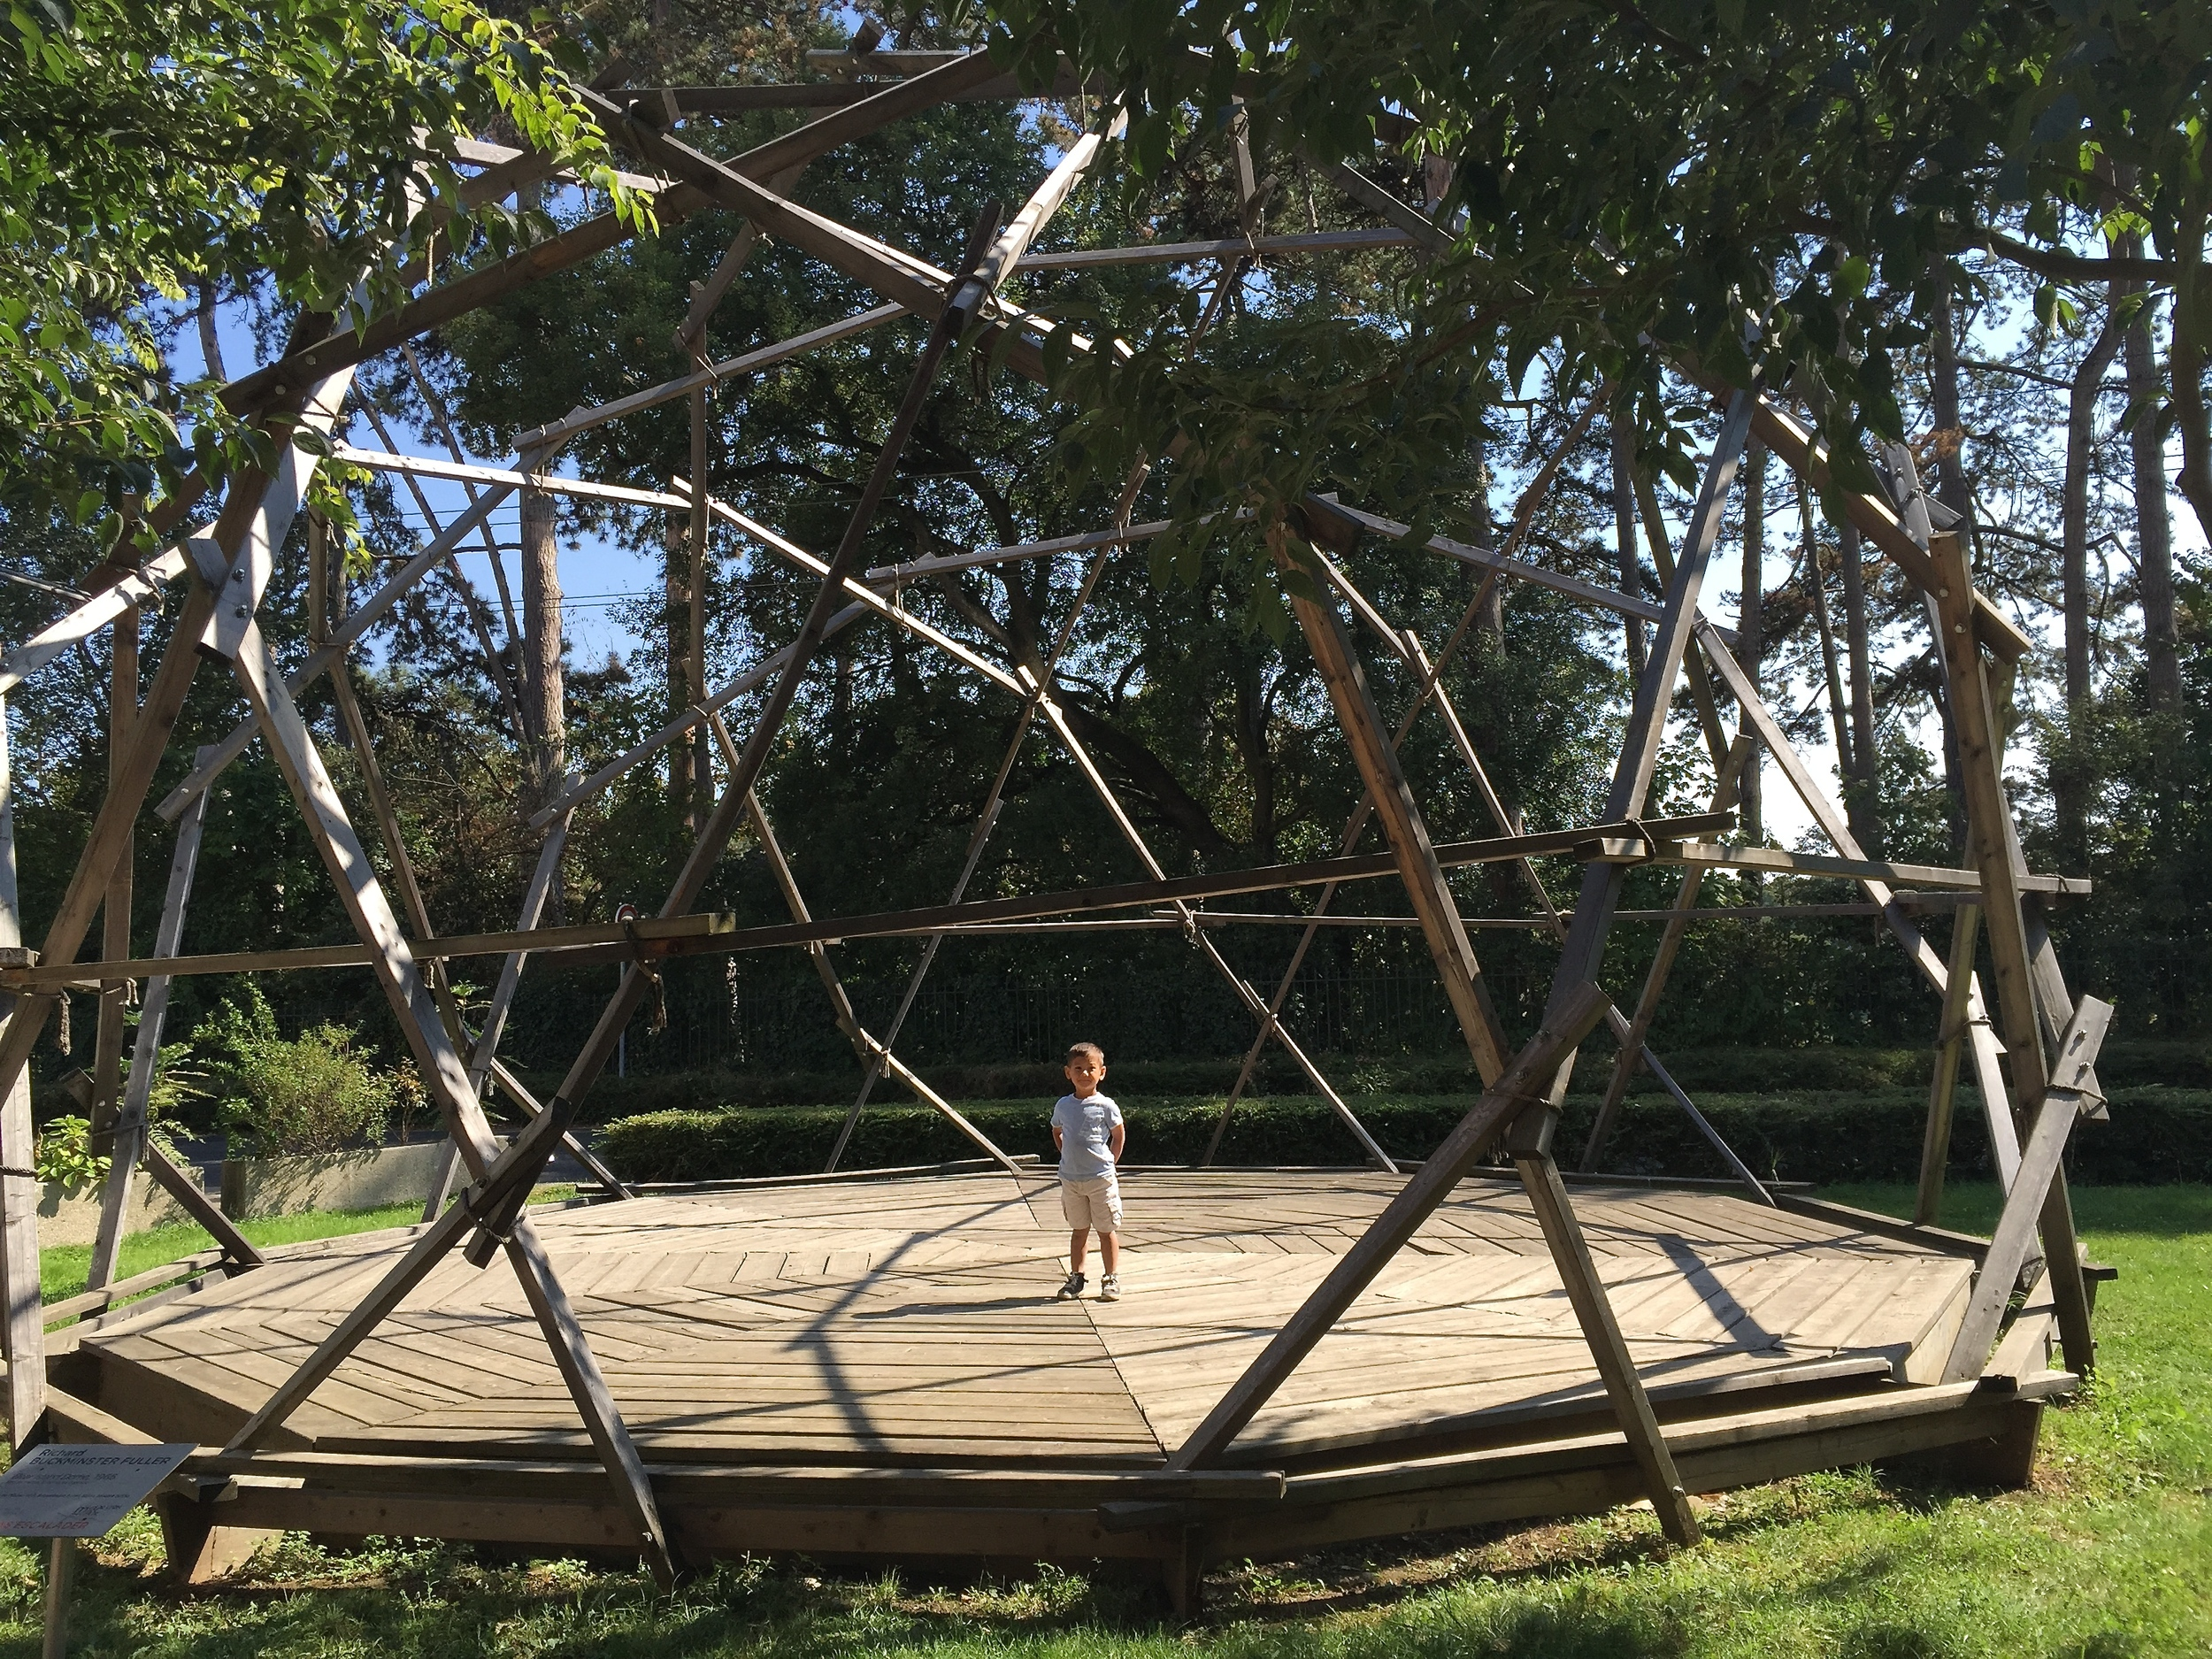 My son in a geometric dome near the Musée d'Art Contemporaine, Lyon, France